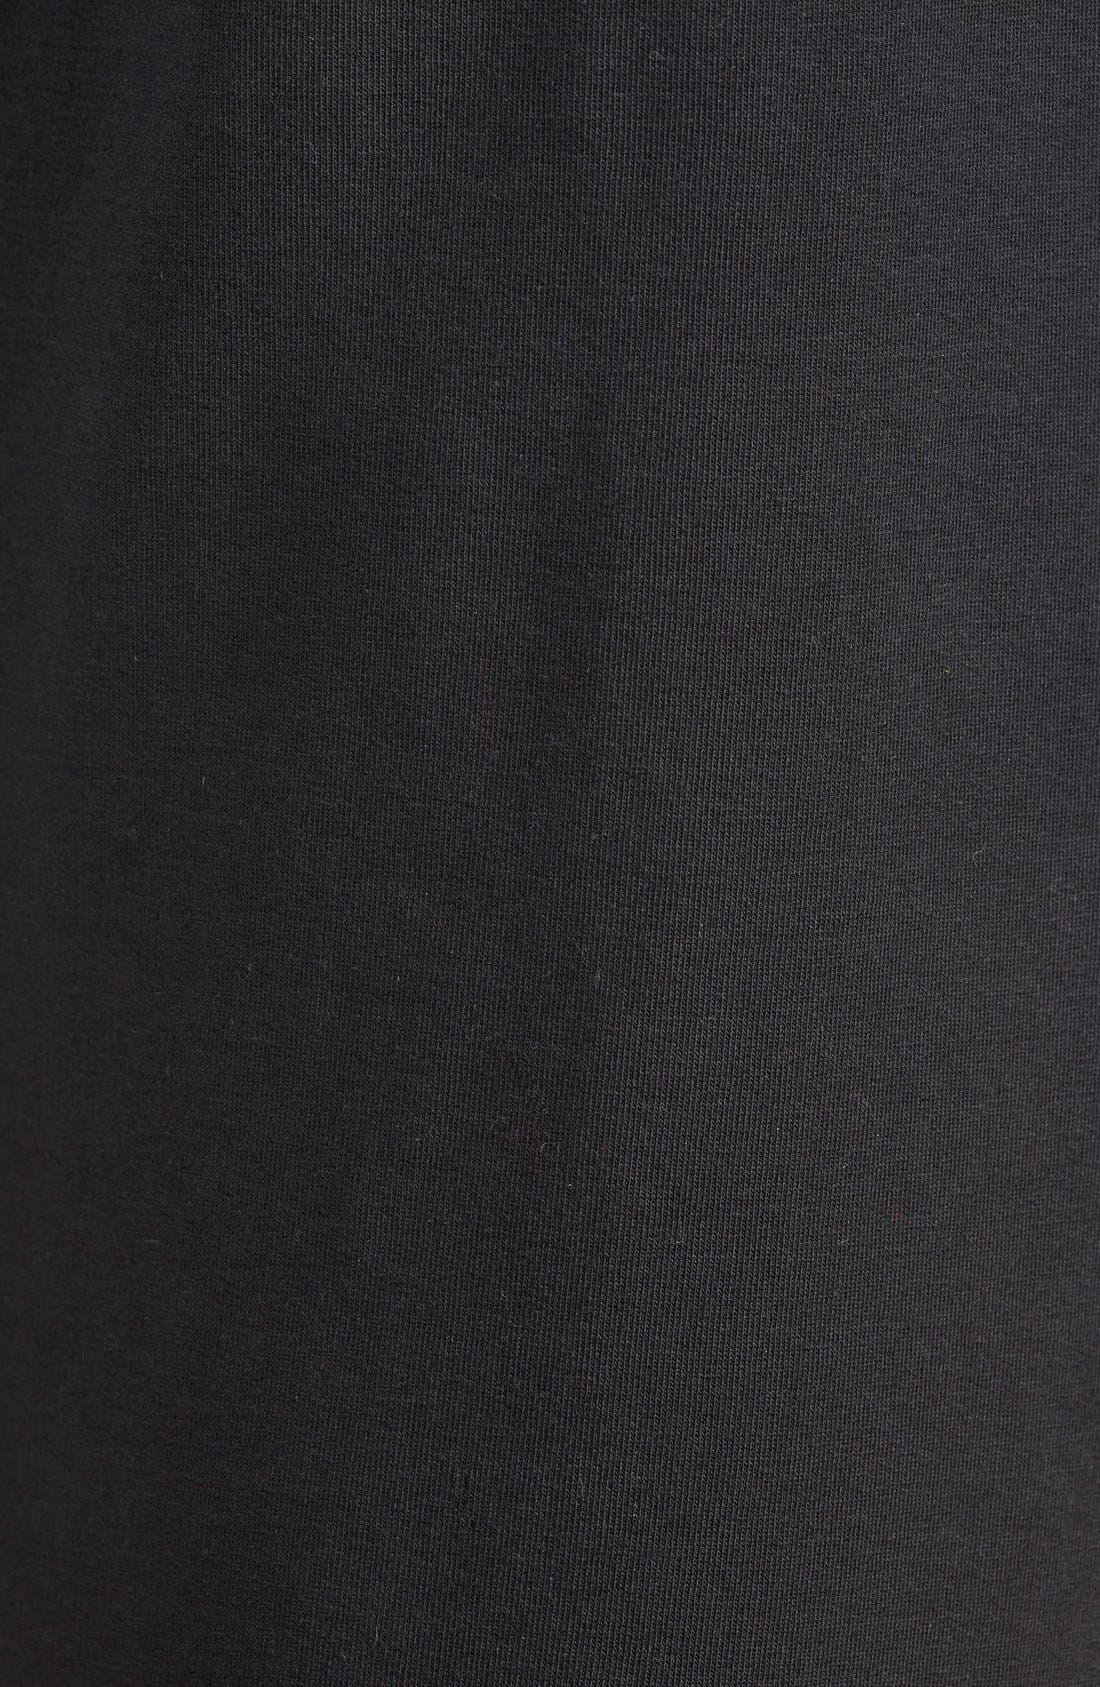 Alternate Image 4  - Nike 'RU Mesh Mix' Cuffed Sweatpants (Women)